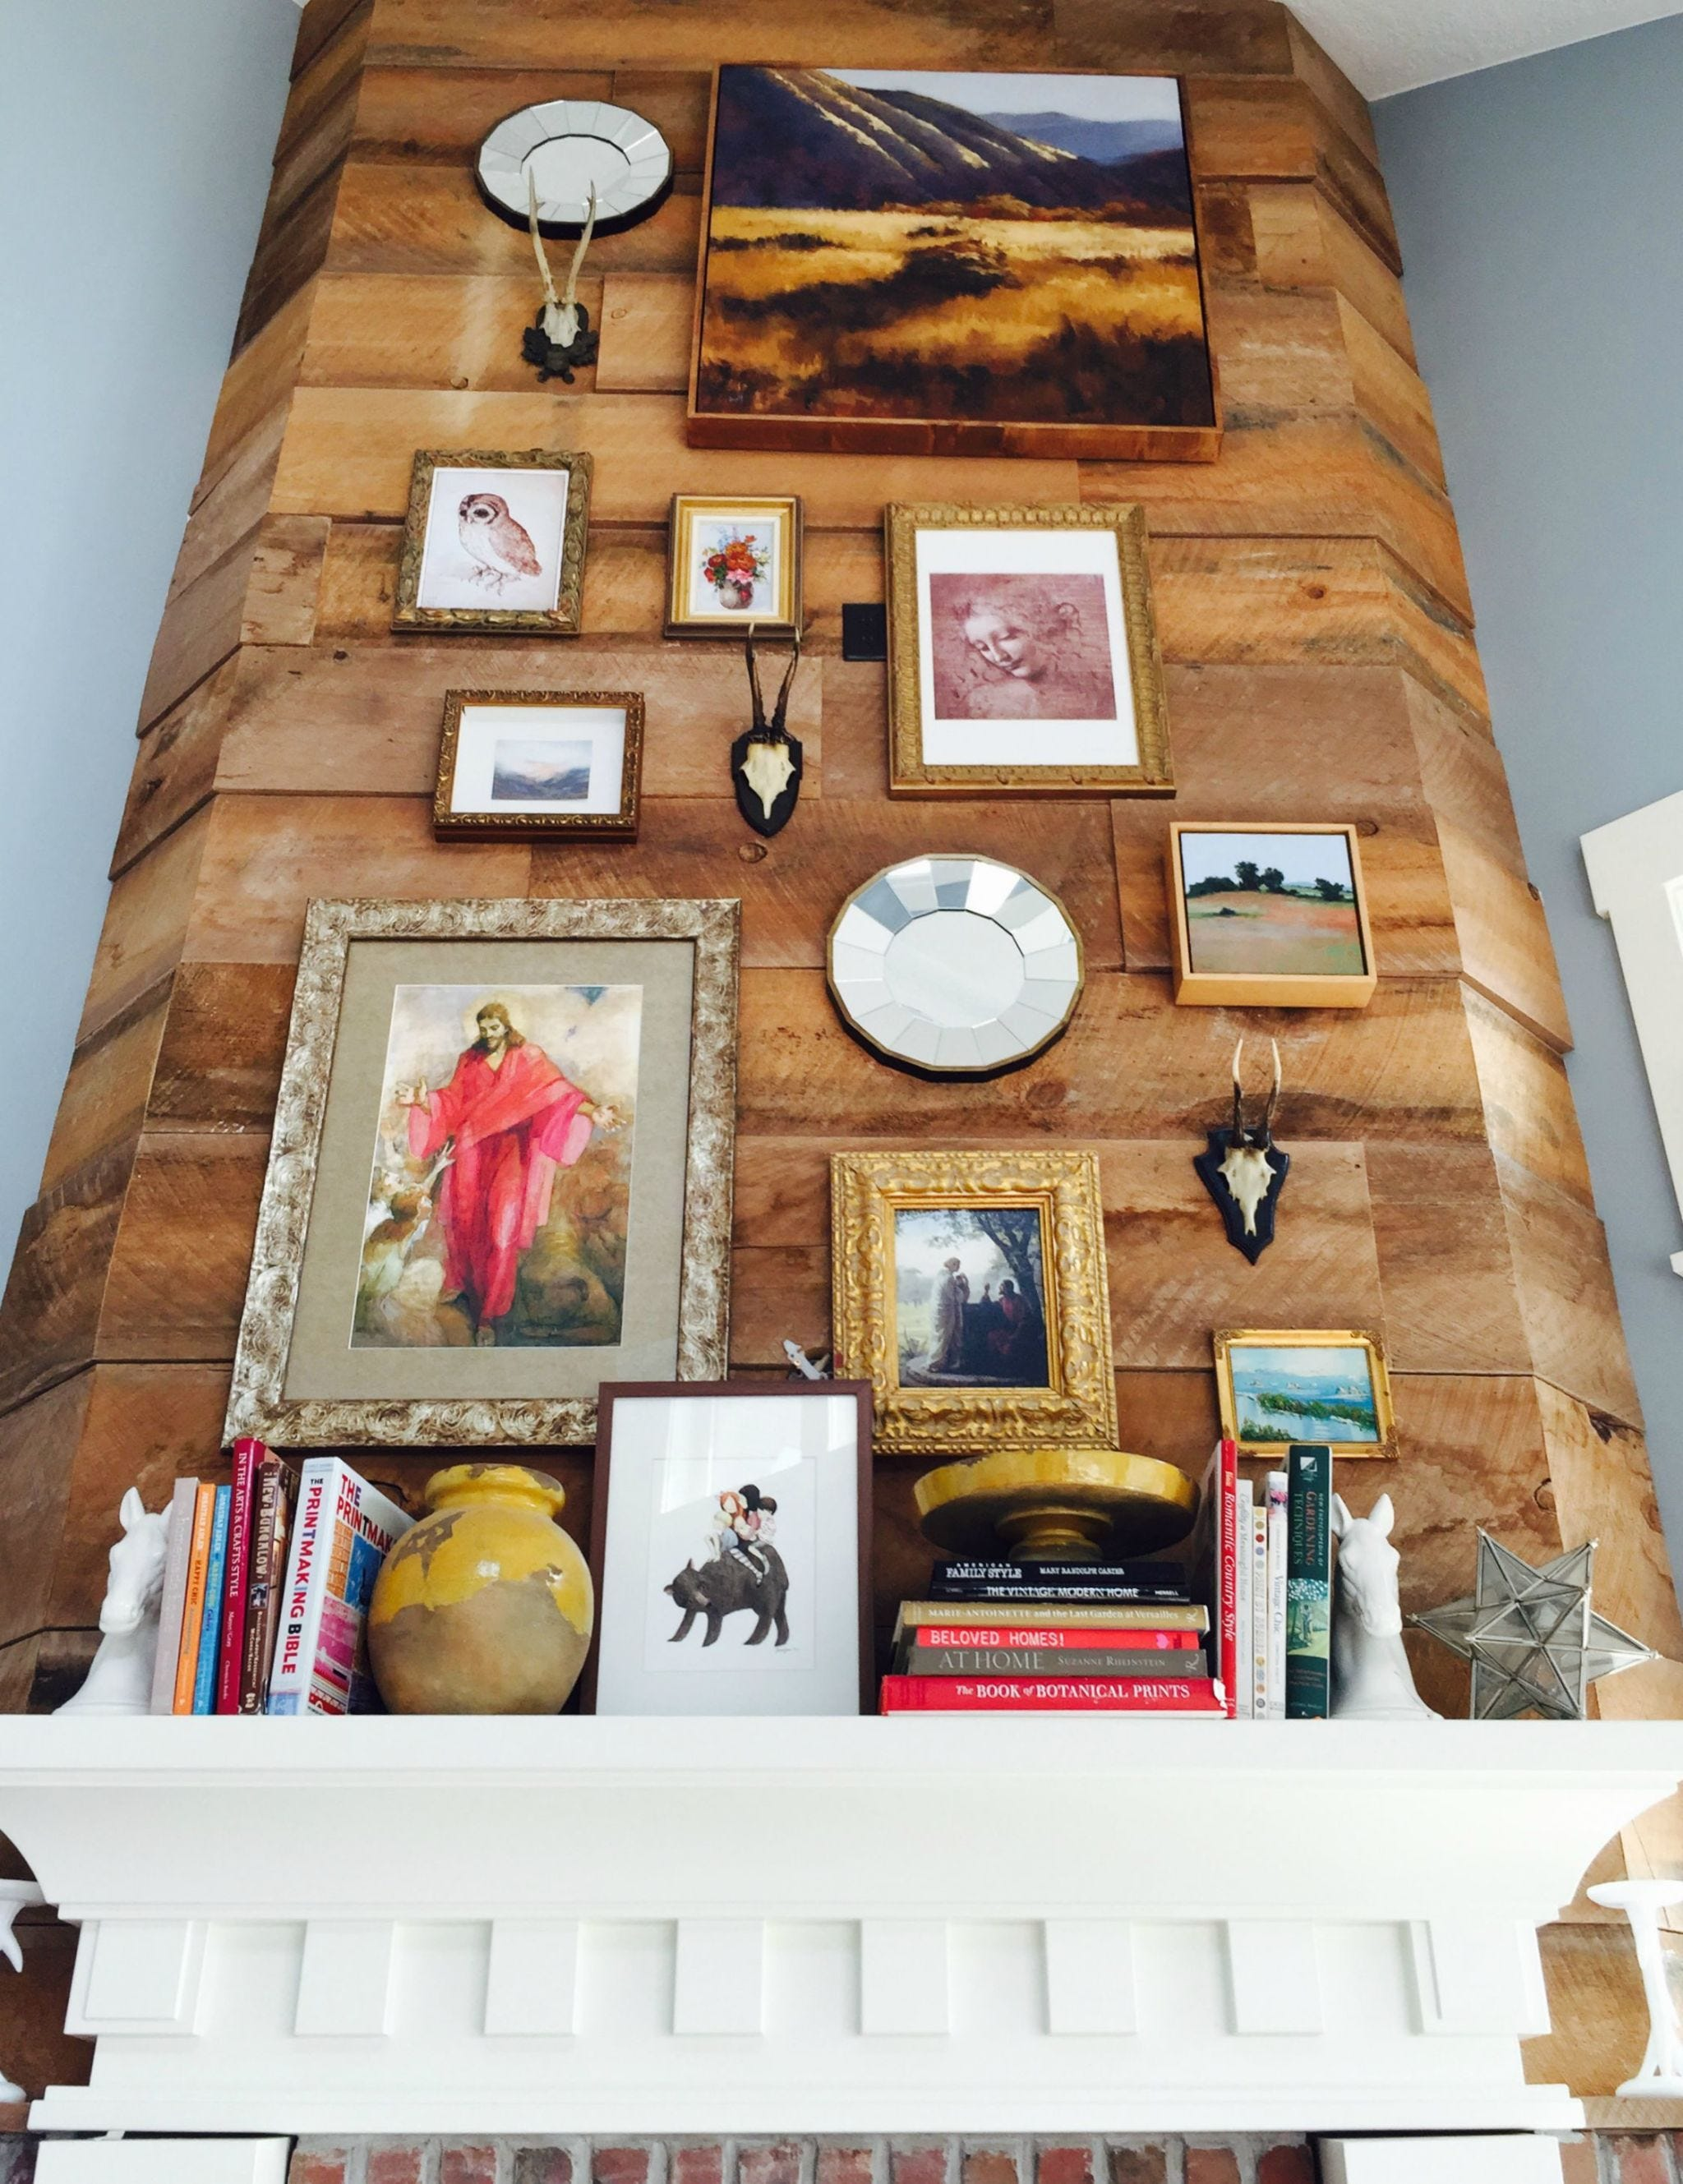 Interior design, Collection, Interior design, Picture frame, Shelving, Shelf, Paint, Creative arts, Craft,